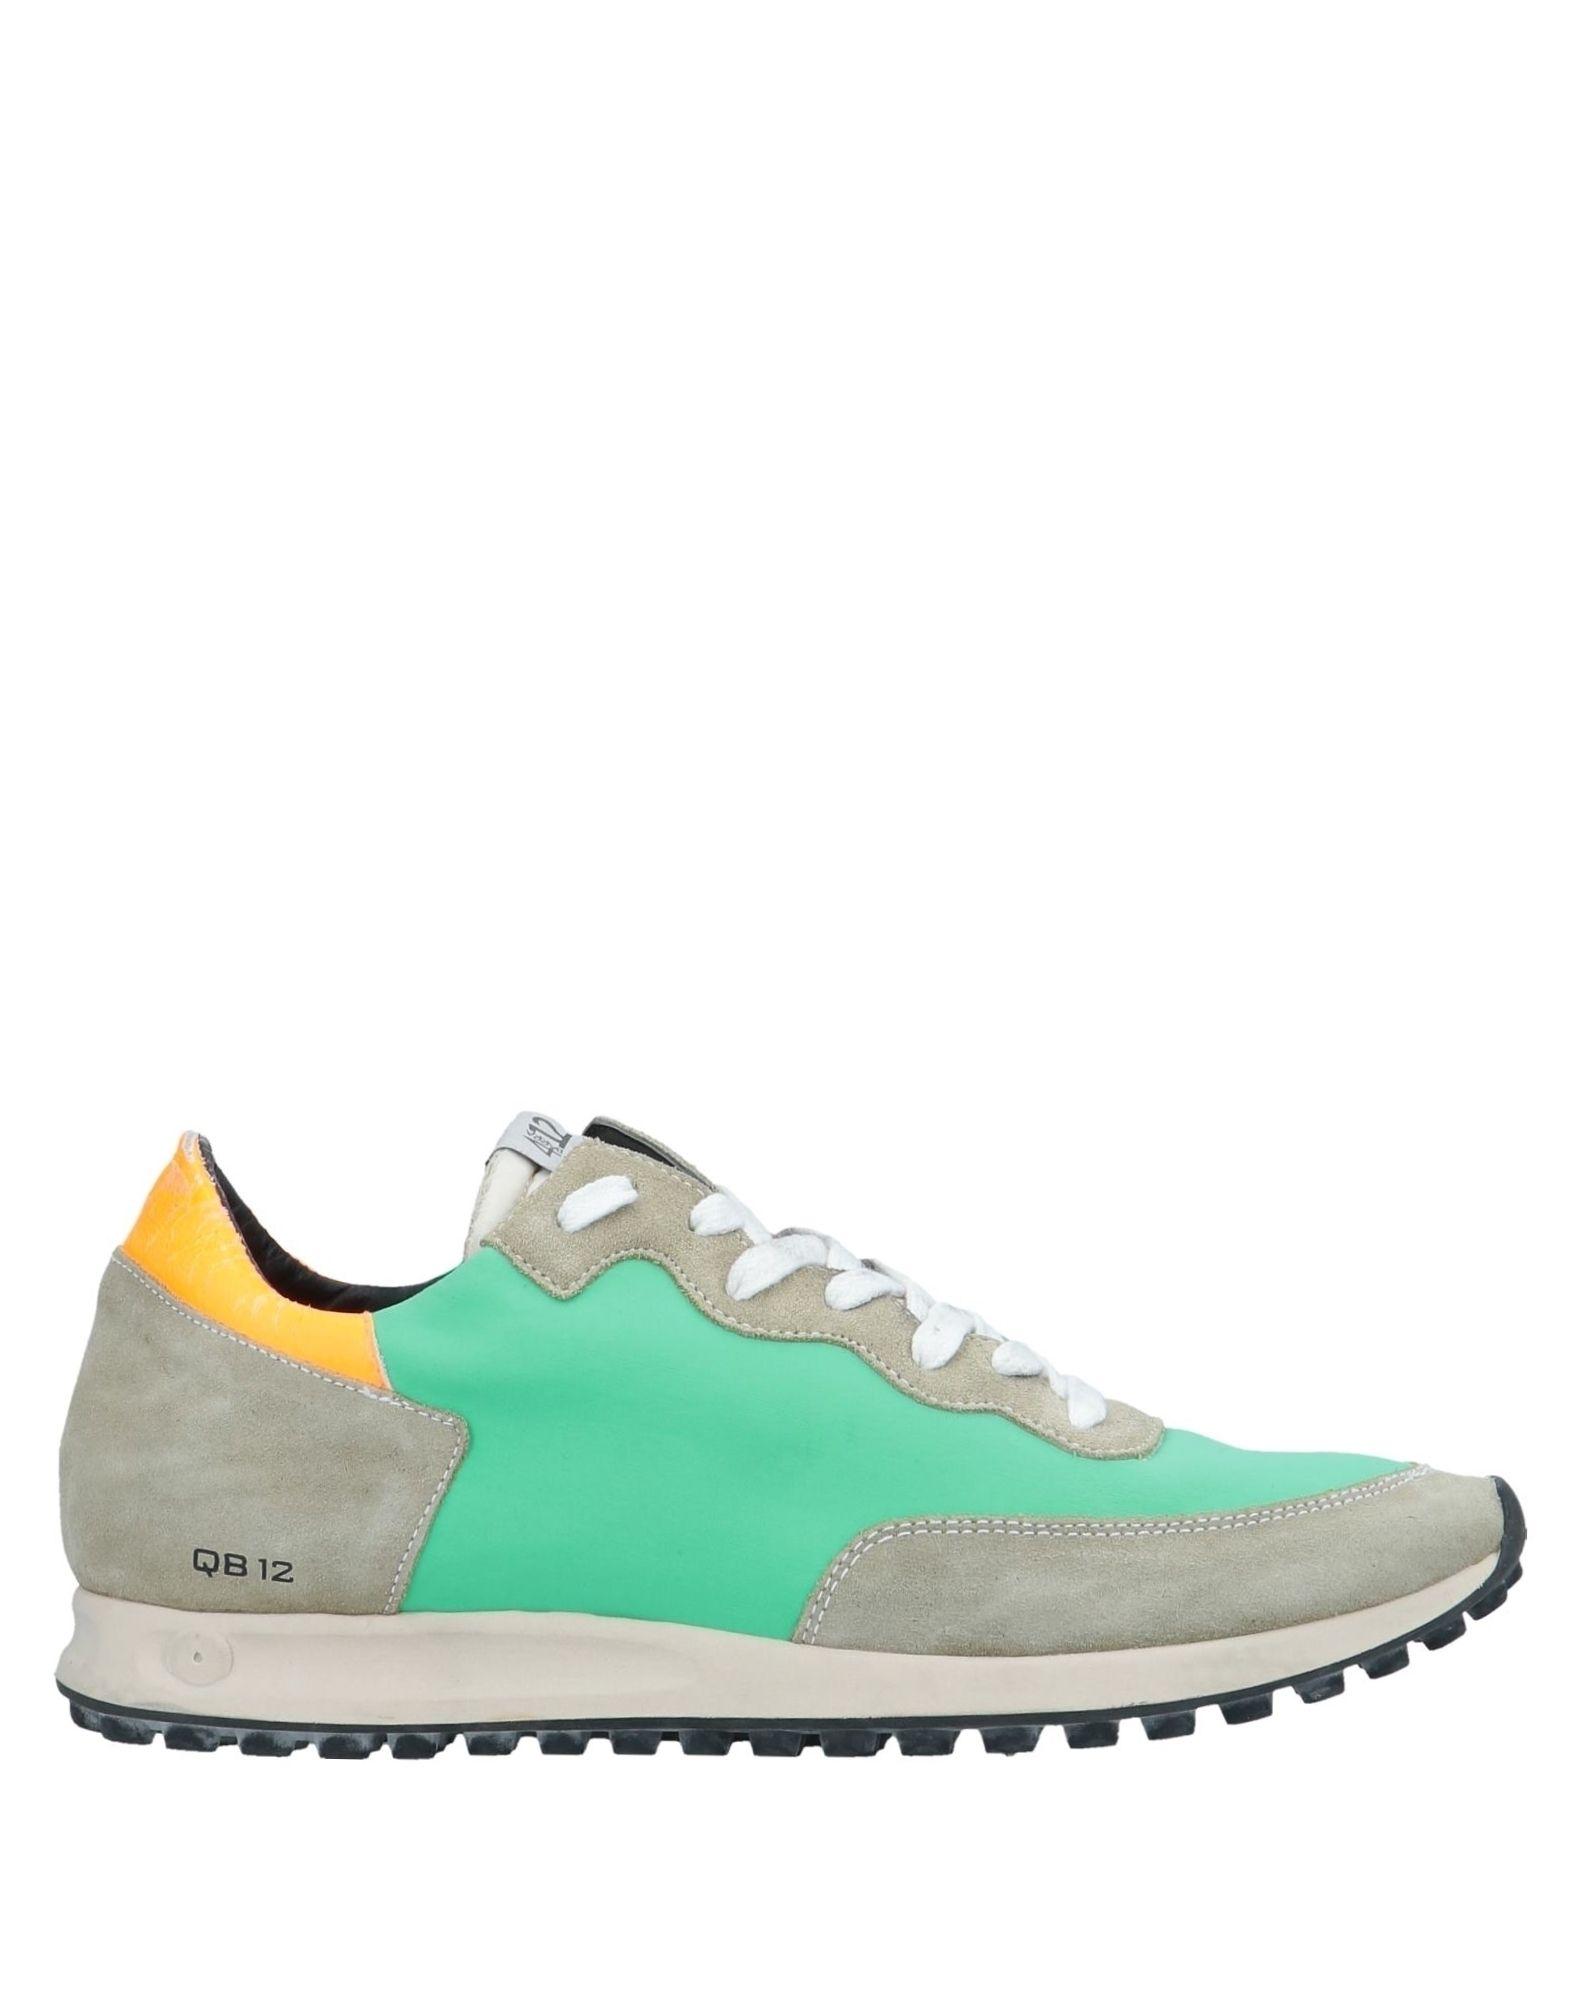 Quattrobarradodici Sneakers - Men Quattrobarradodici Sneakers - online on  Australia - Sneakers 11573405LW 7793fa